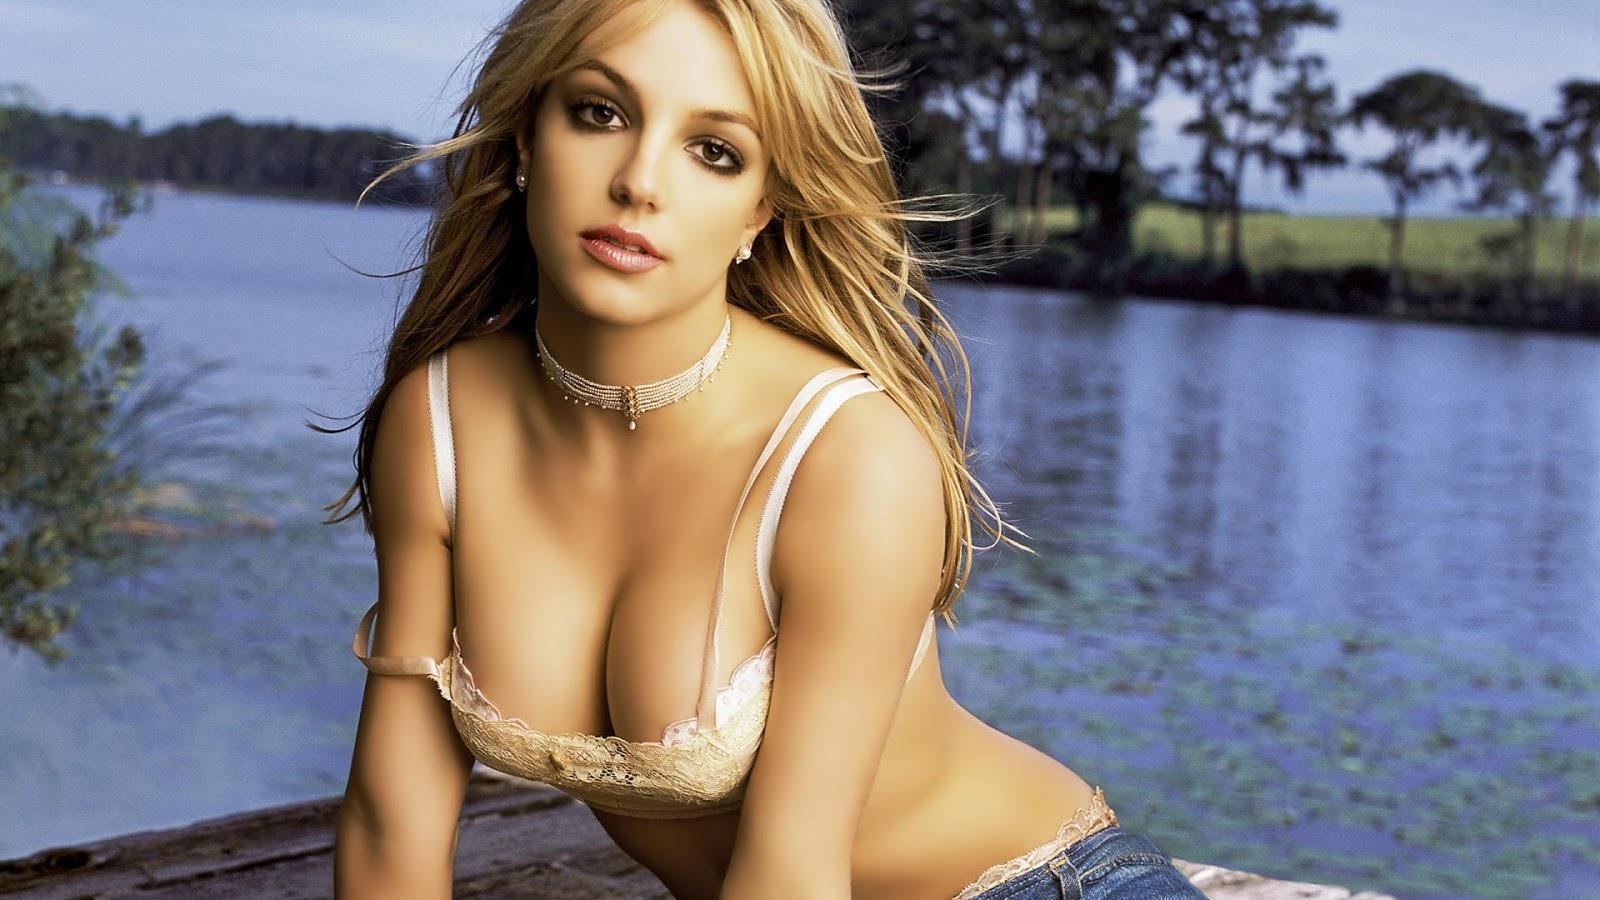 Super Hot Model Britney Spears HD Hot Wallpaper